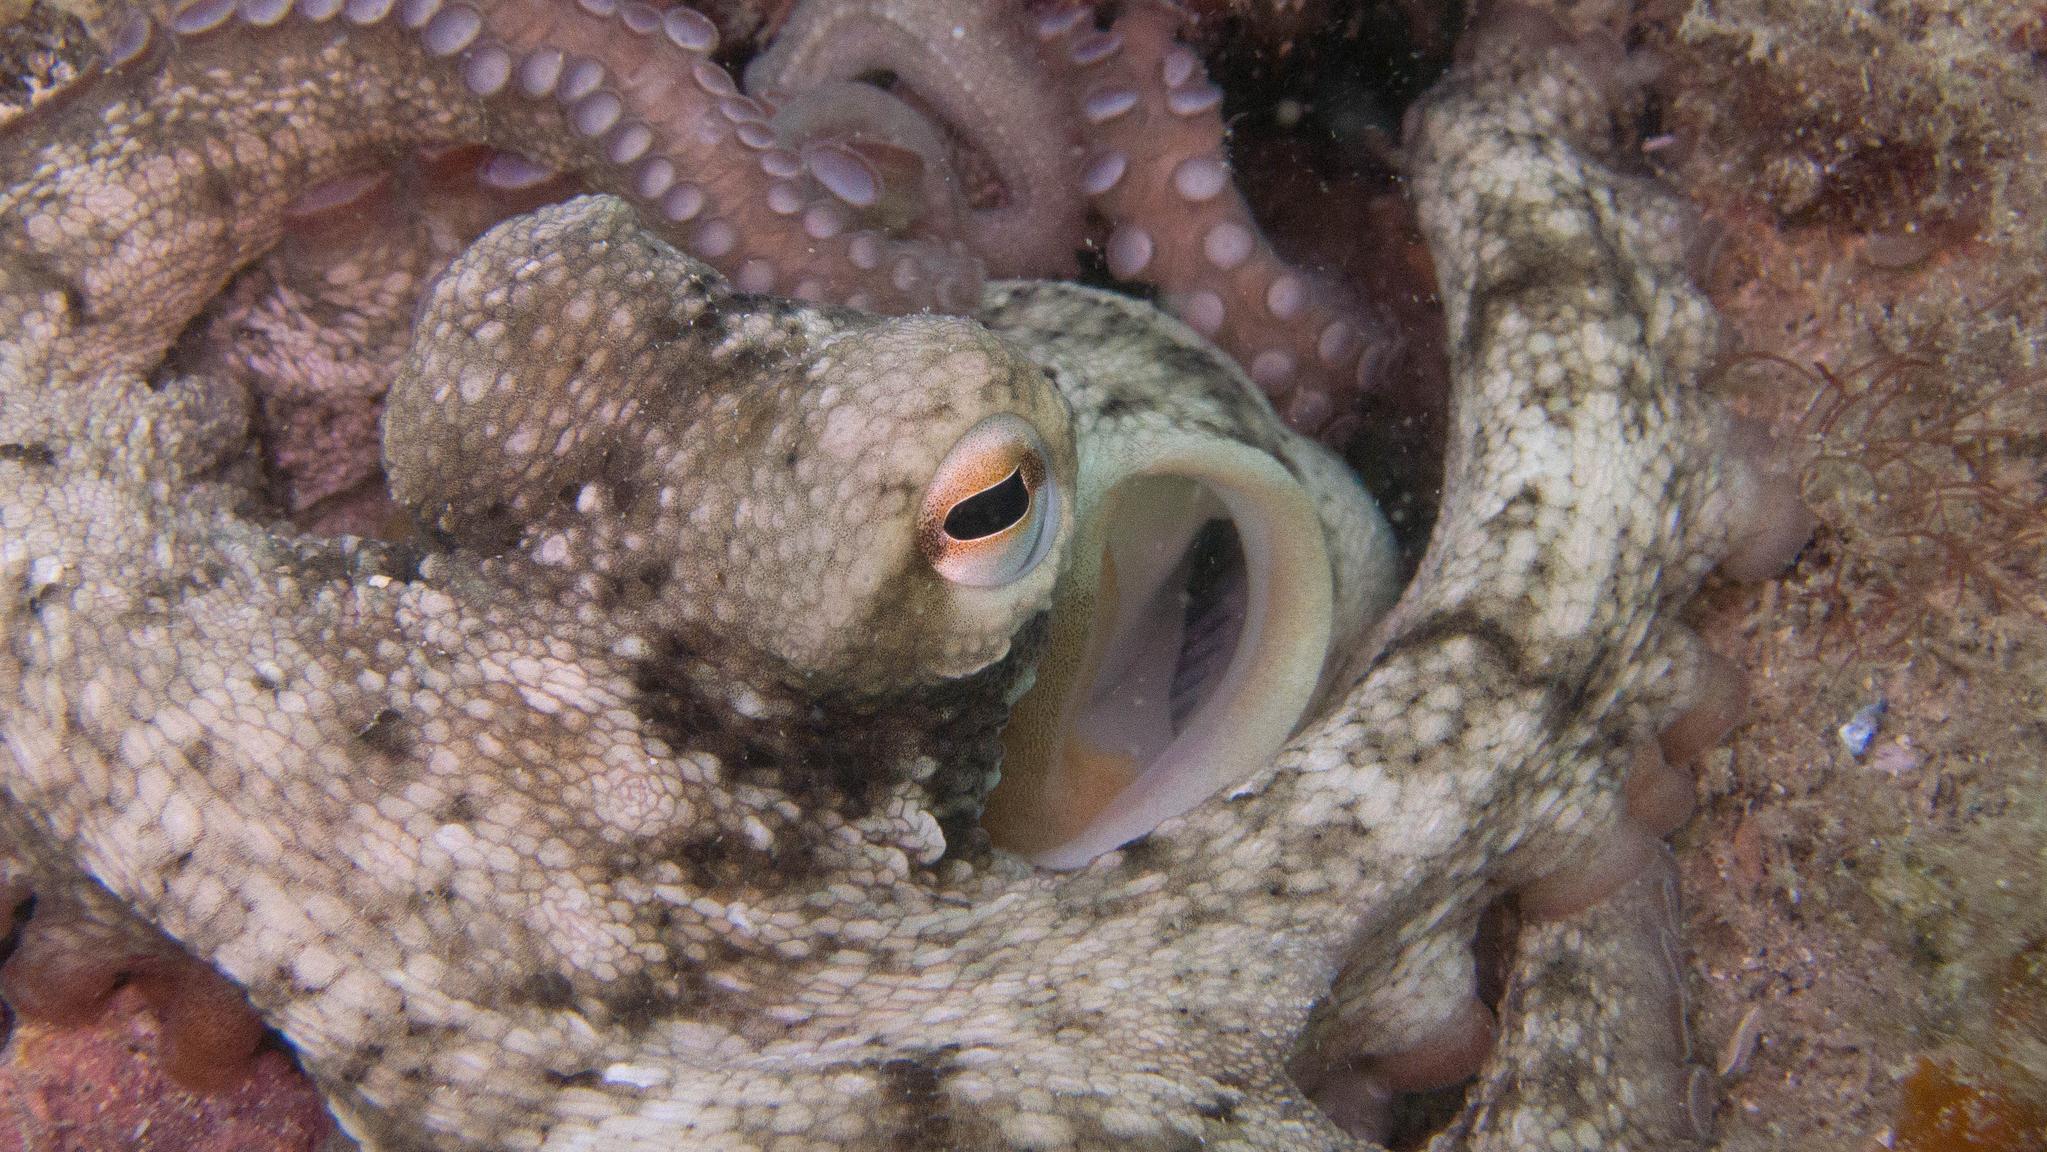 gloomy-octopus_2048x1152